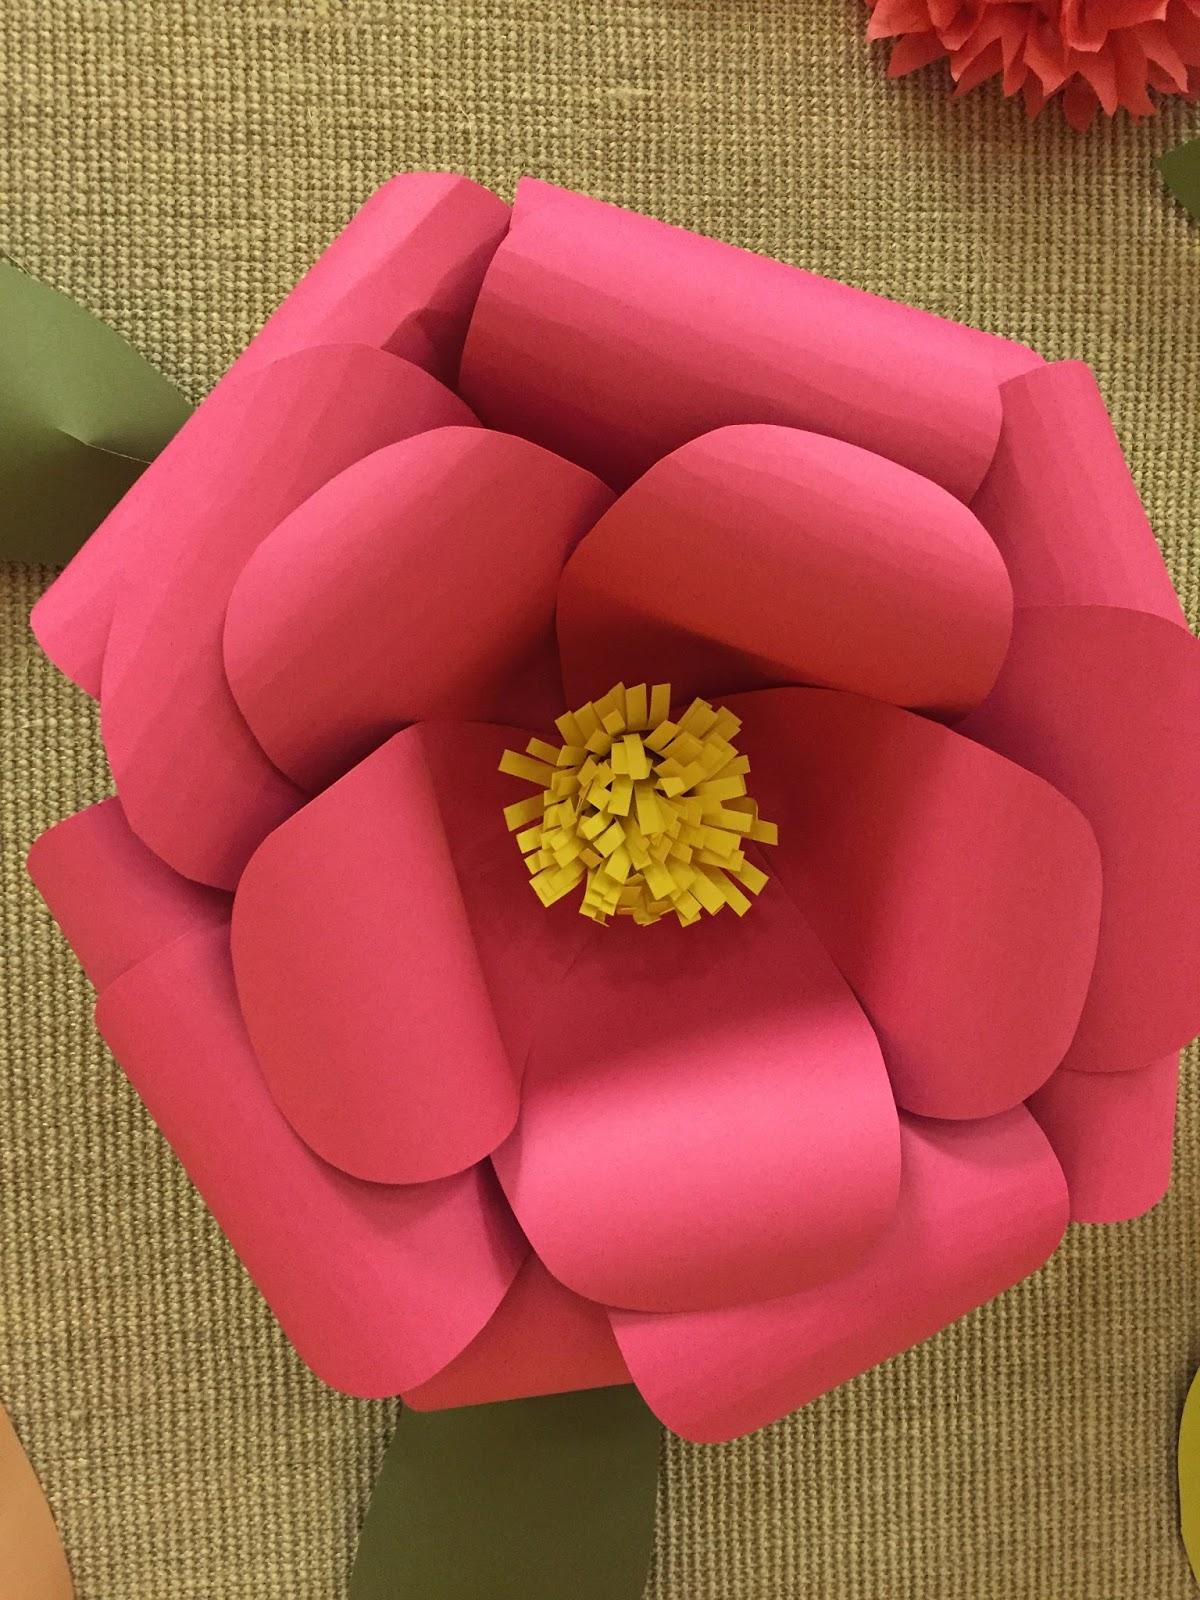 Sew Fun 2 Quilt Paper Decorations